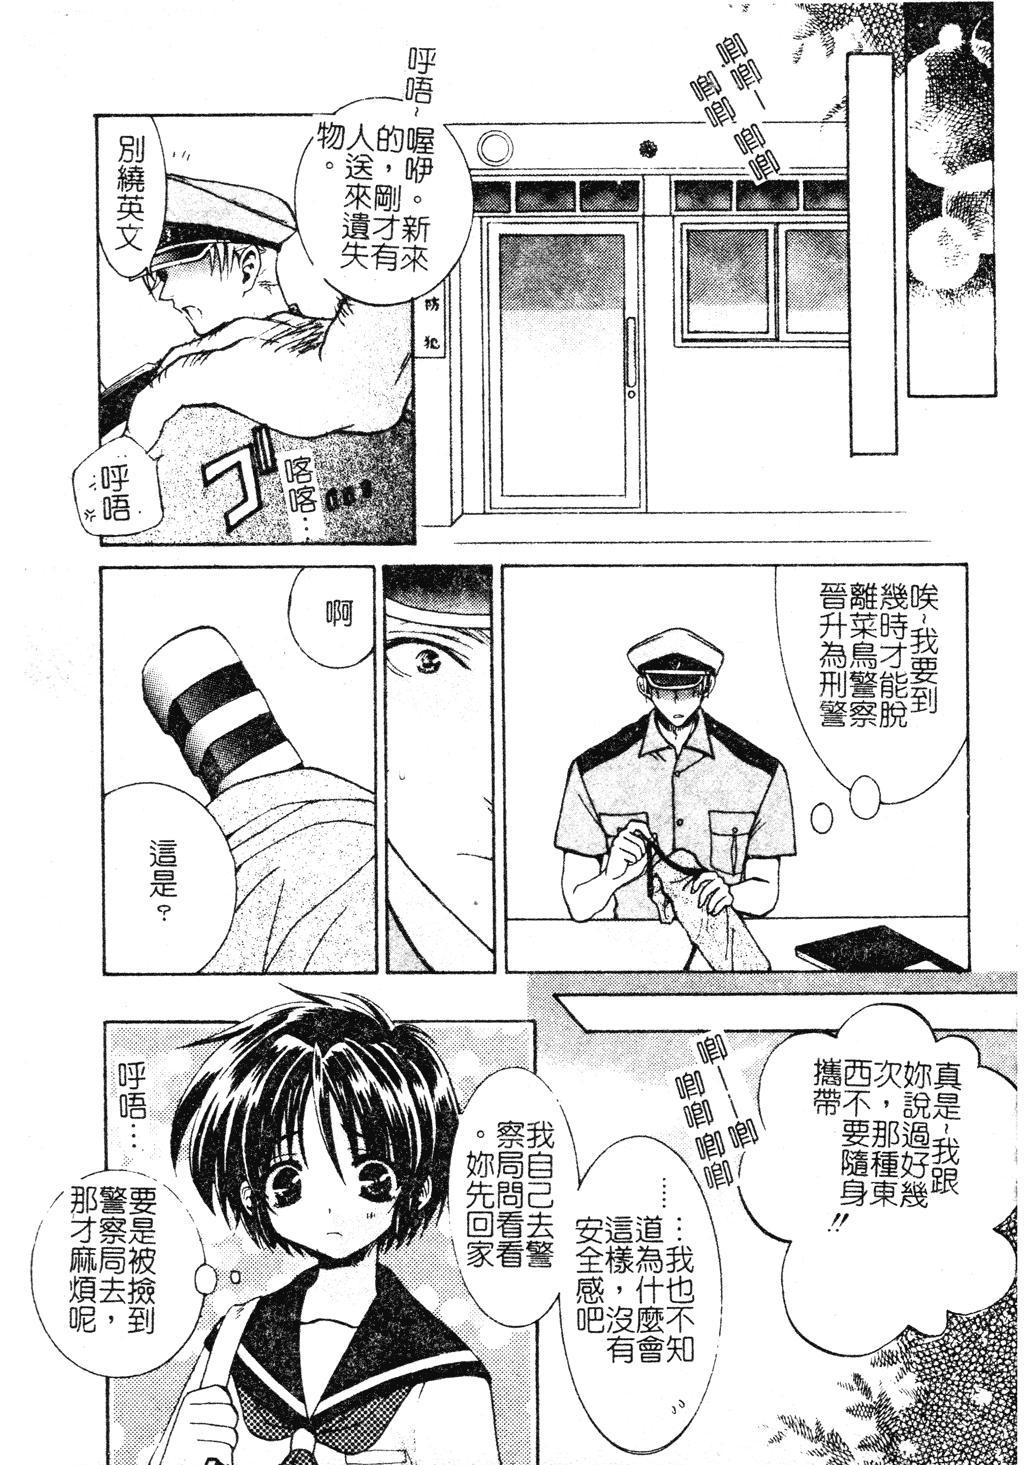 DenNow Koihime Collection 7 91